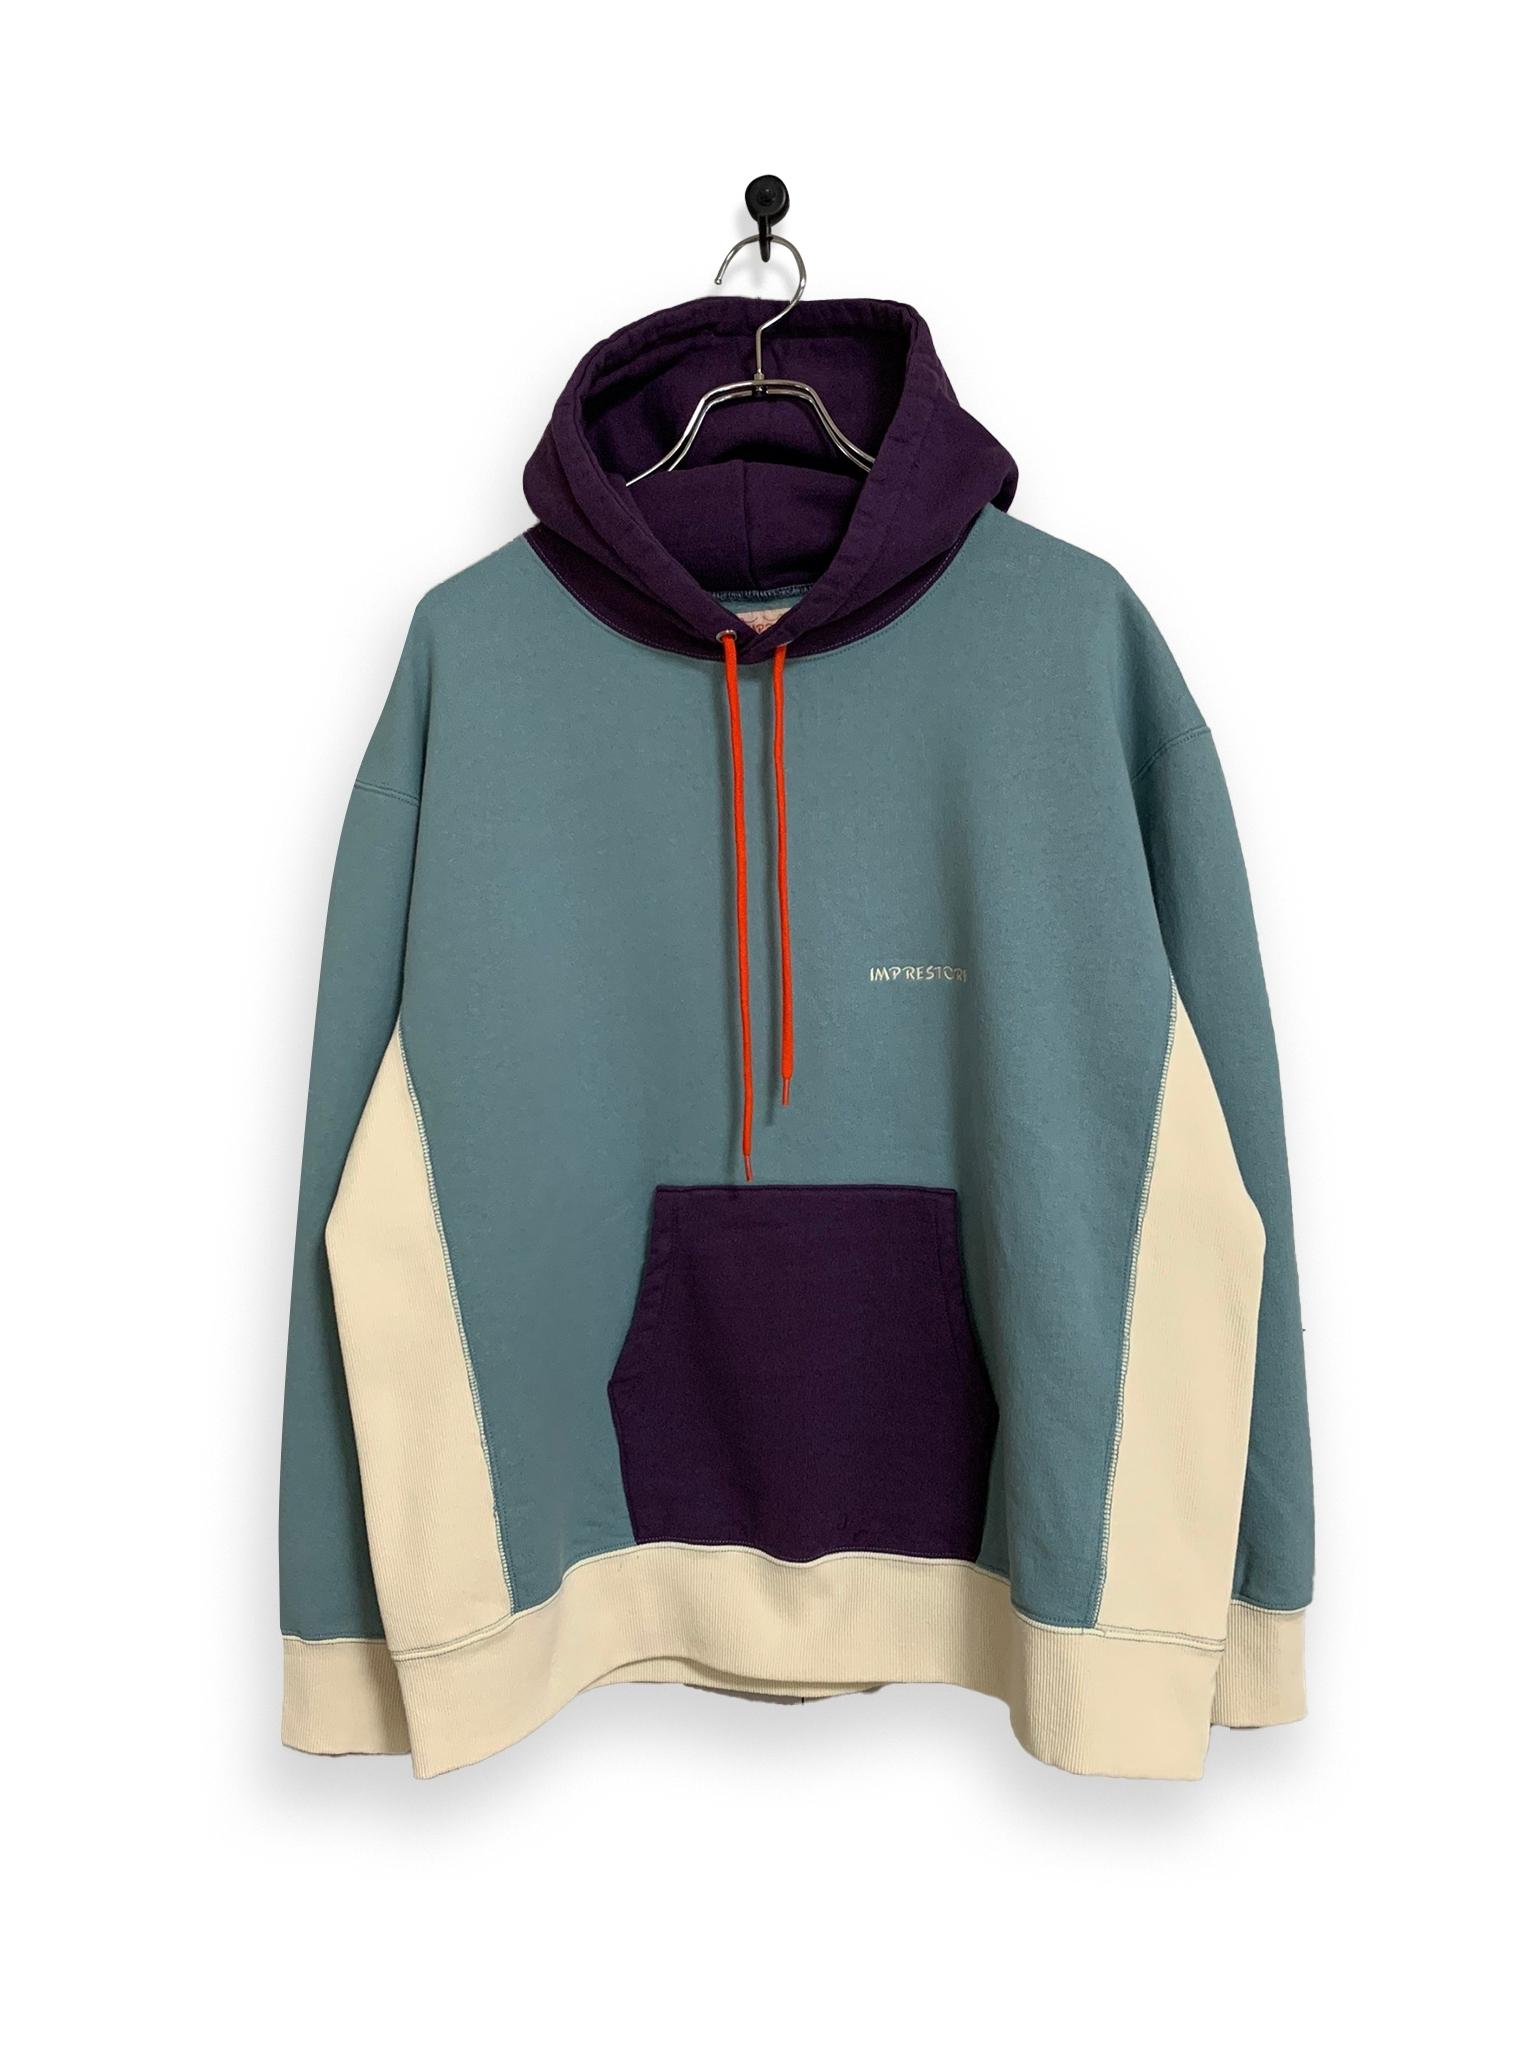 Original Hooded Sweatshirt / 3tone / sax blue × purple × white